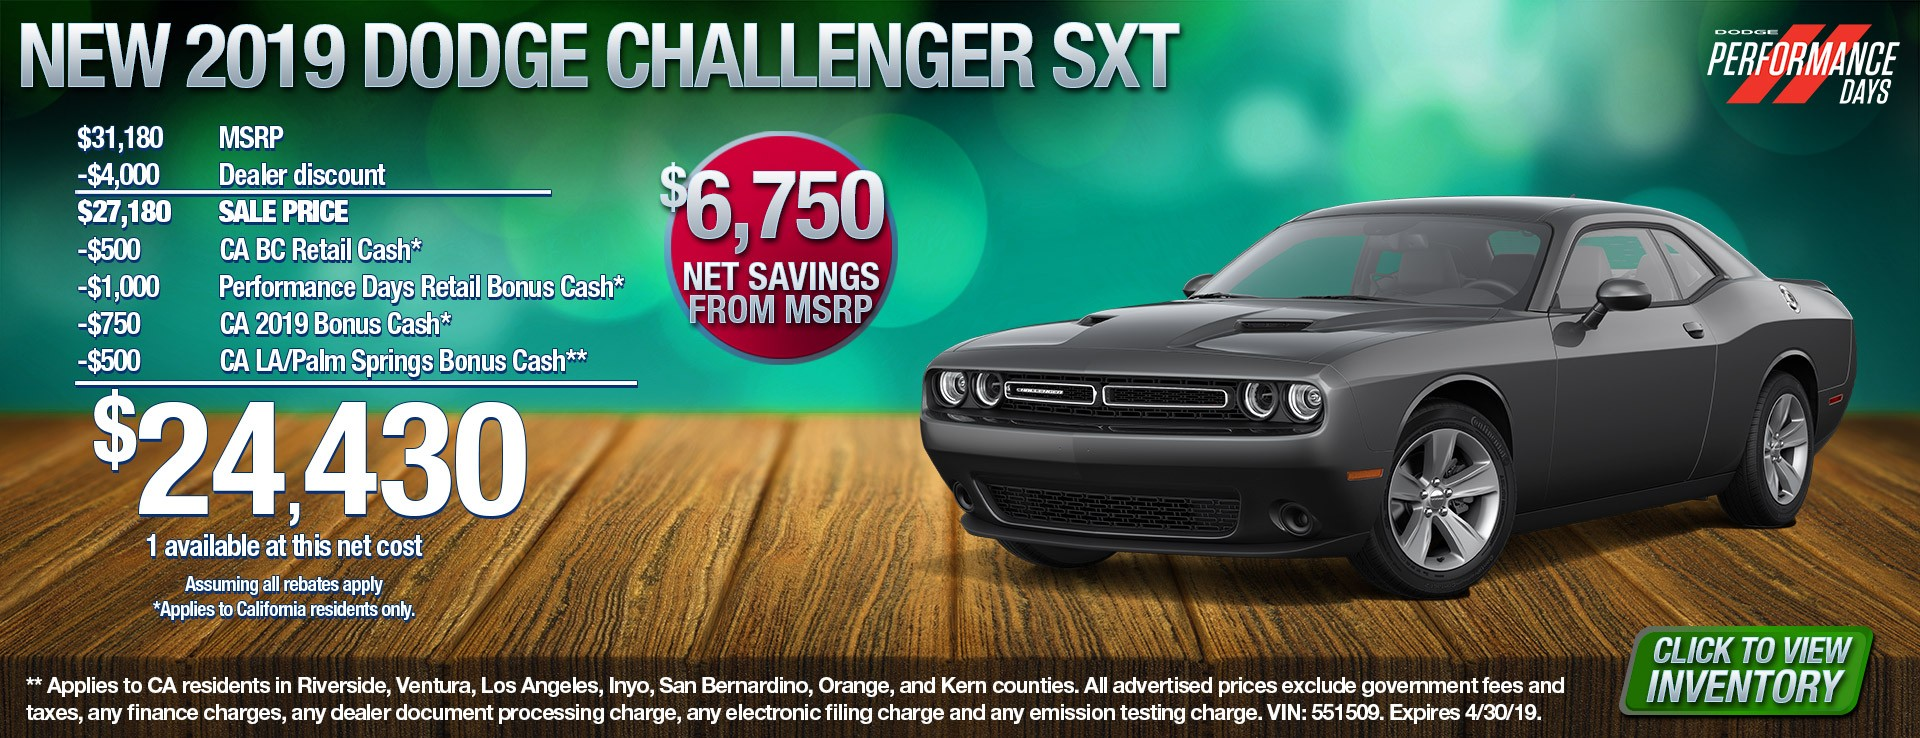 19 Dodge Challenger